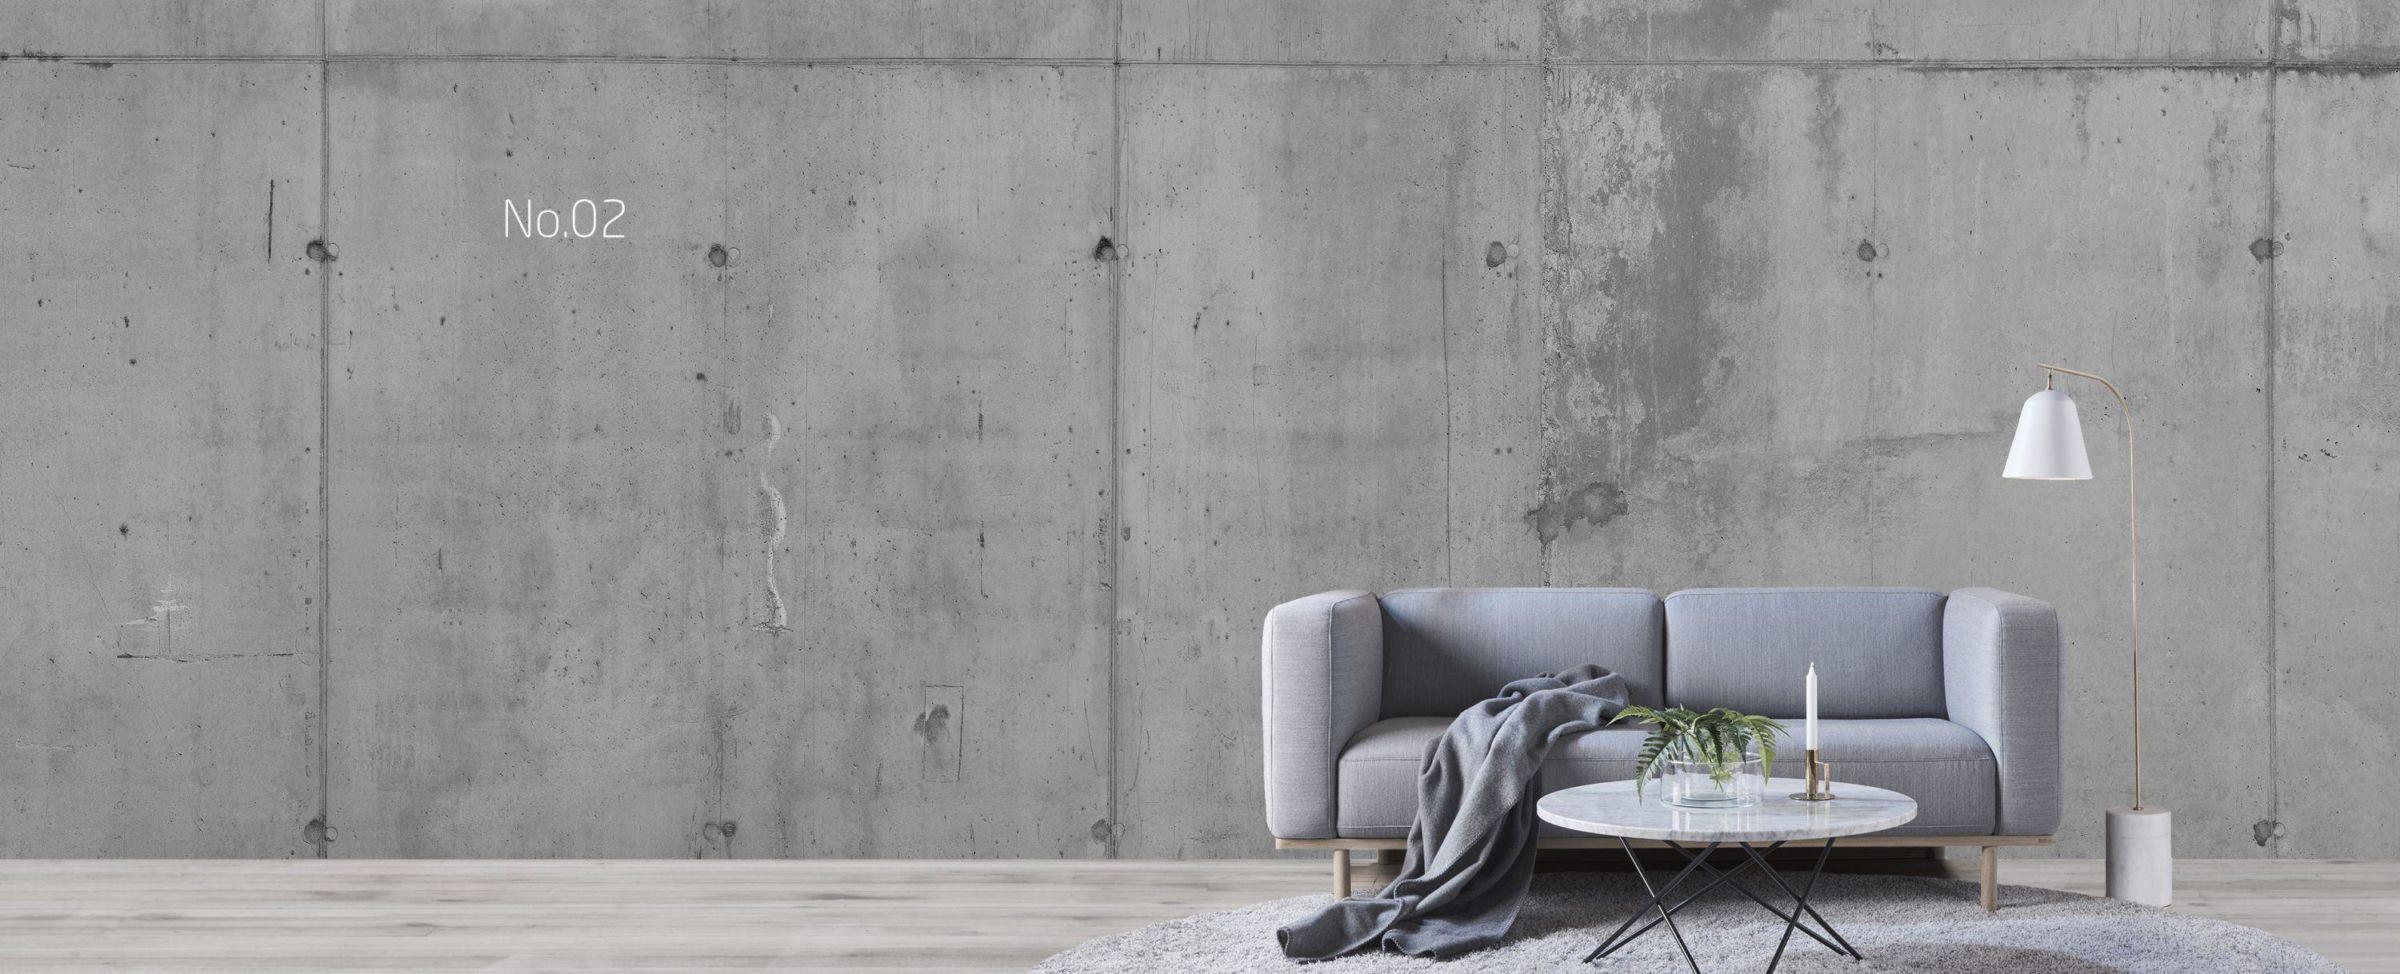 Unique Wallpaper Concrete Wall Wallpaper house design